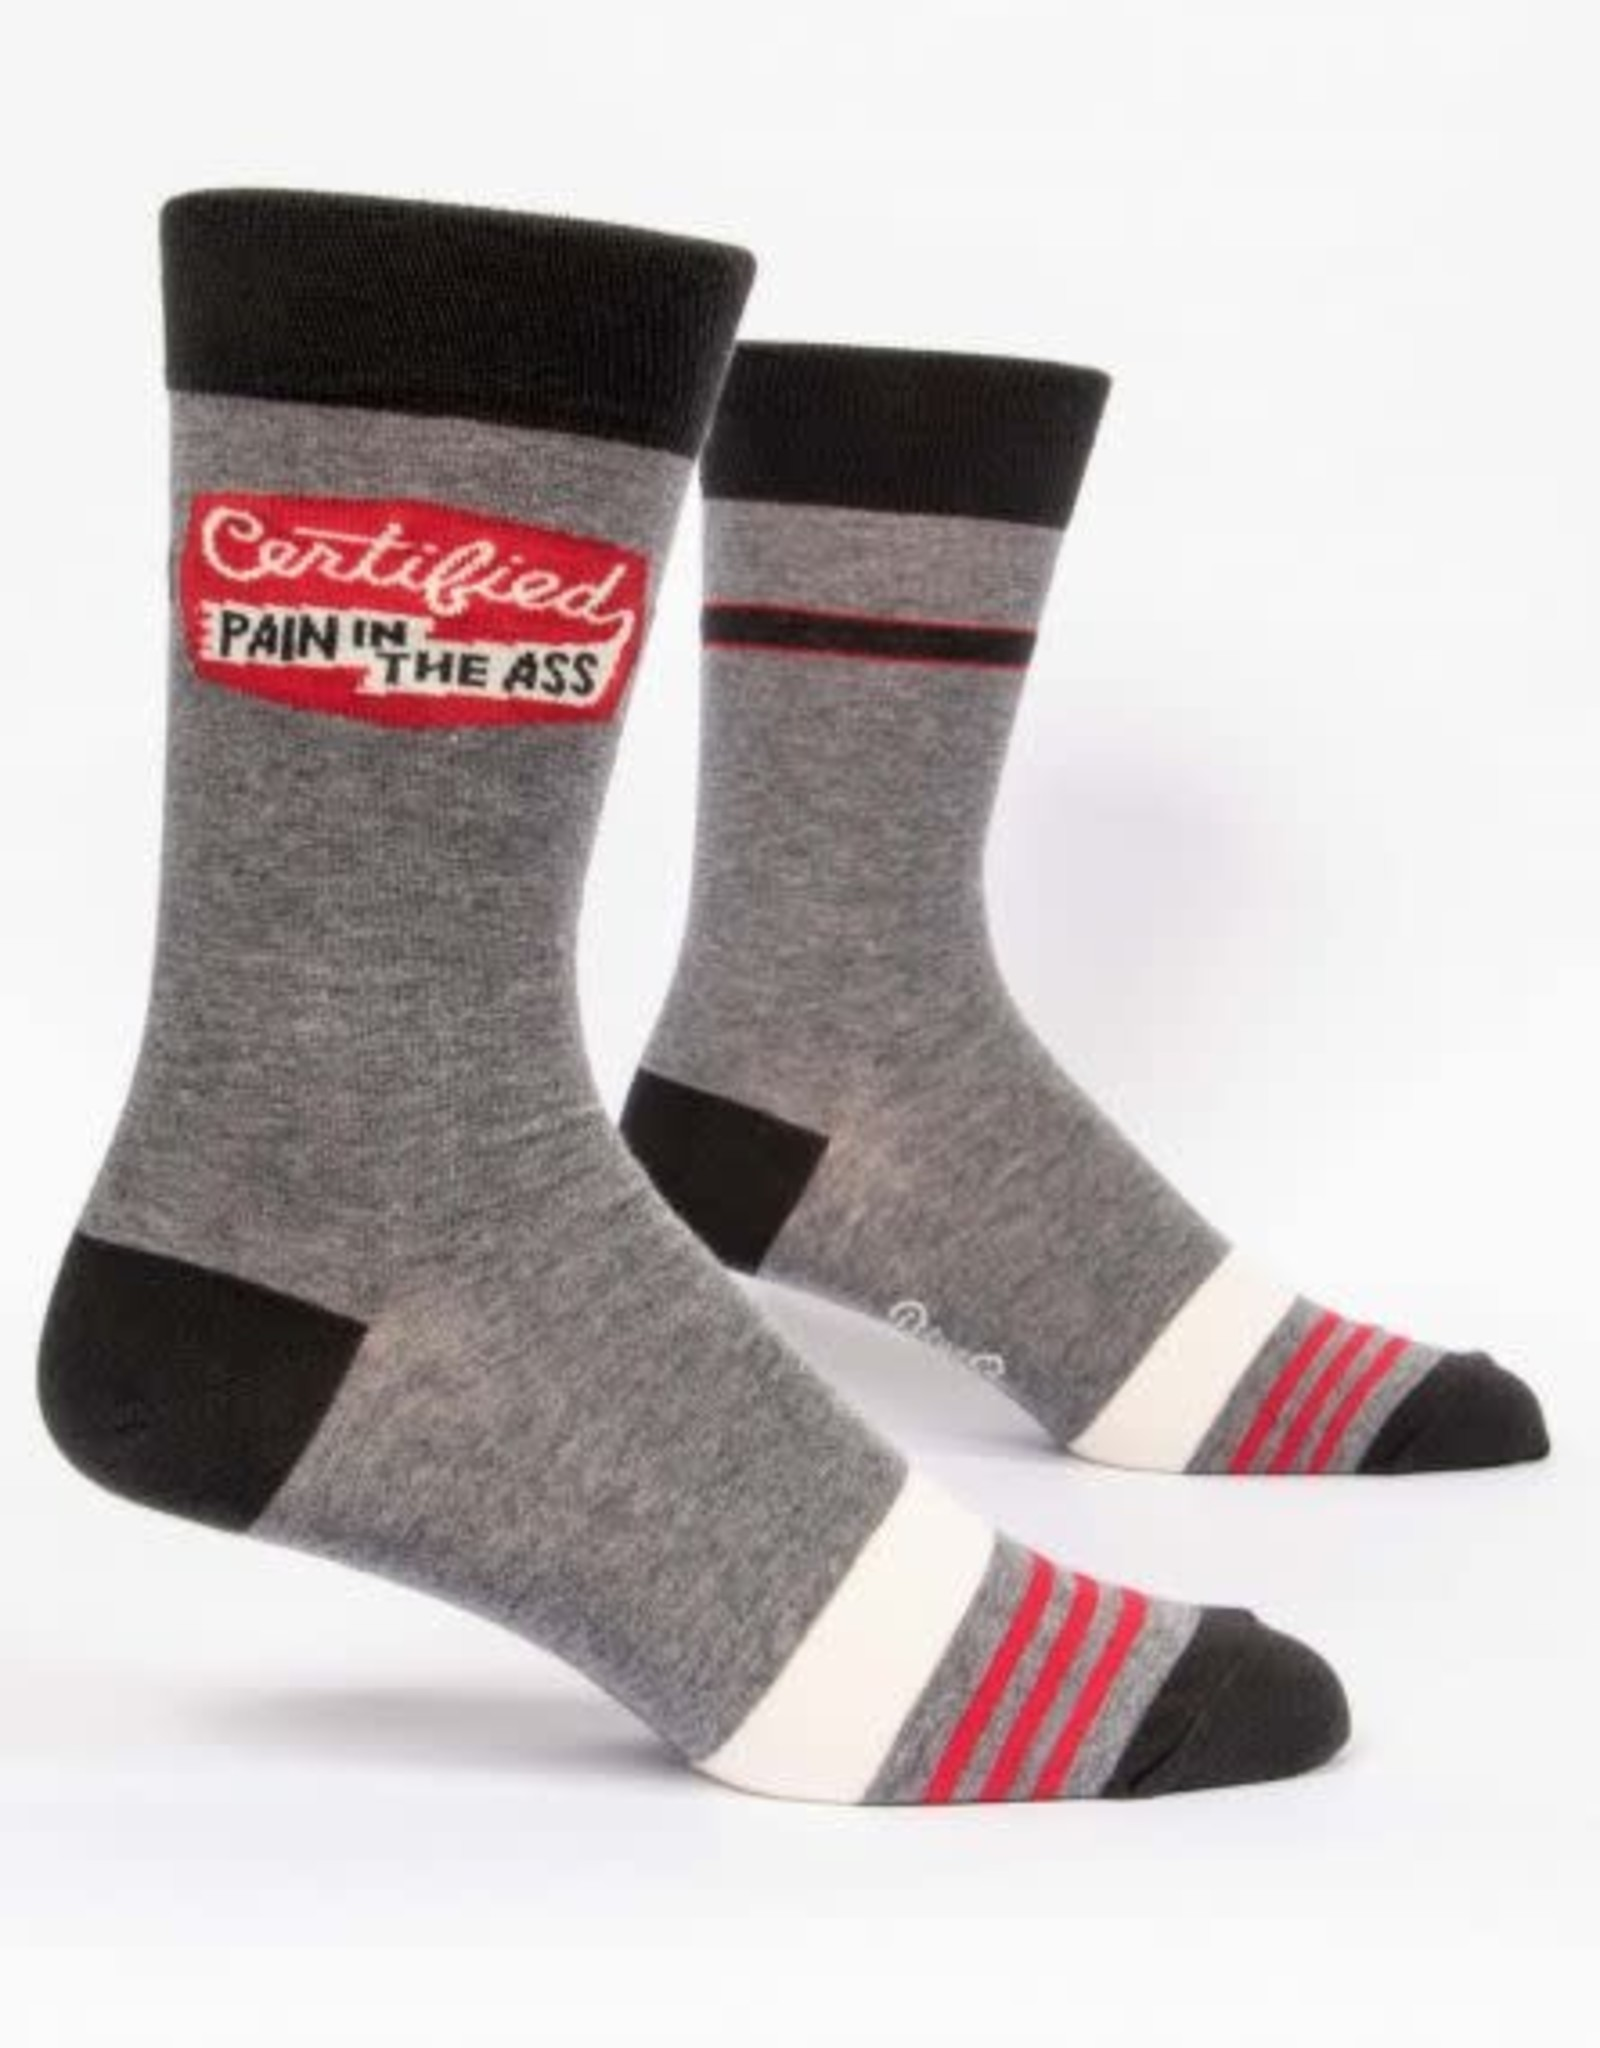 Blue Q Blue Q Mens Socks Certified Pain